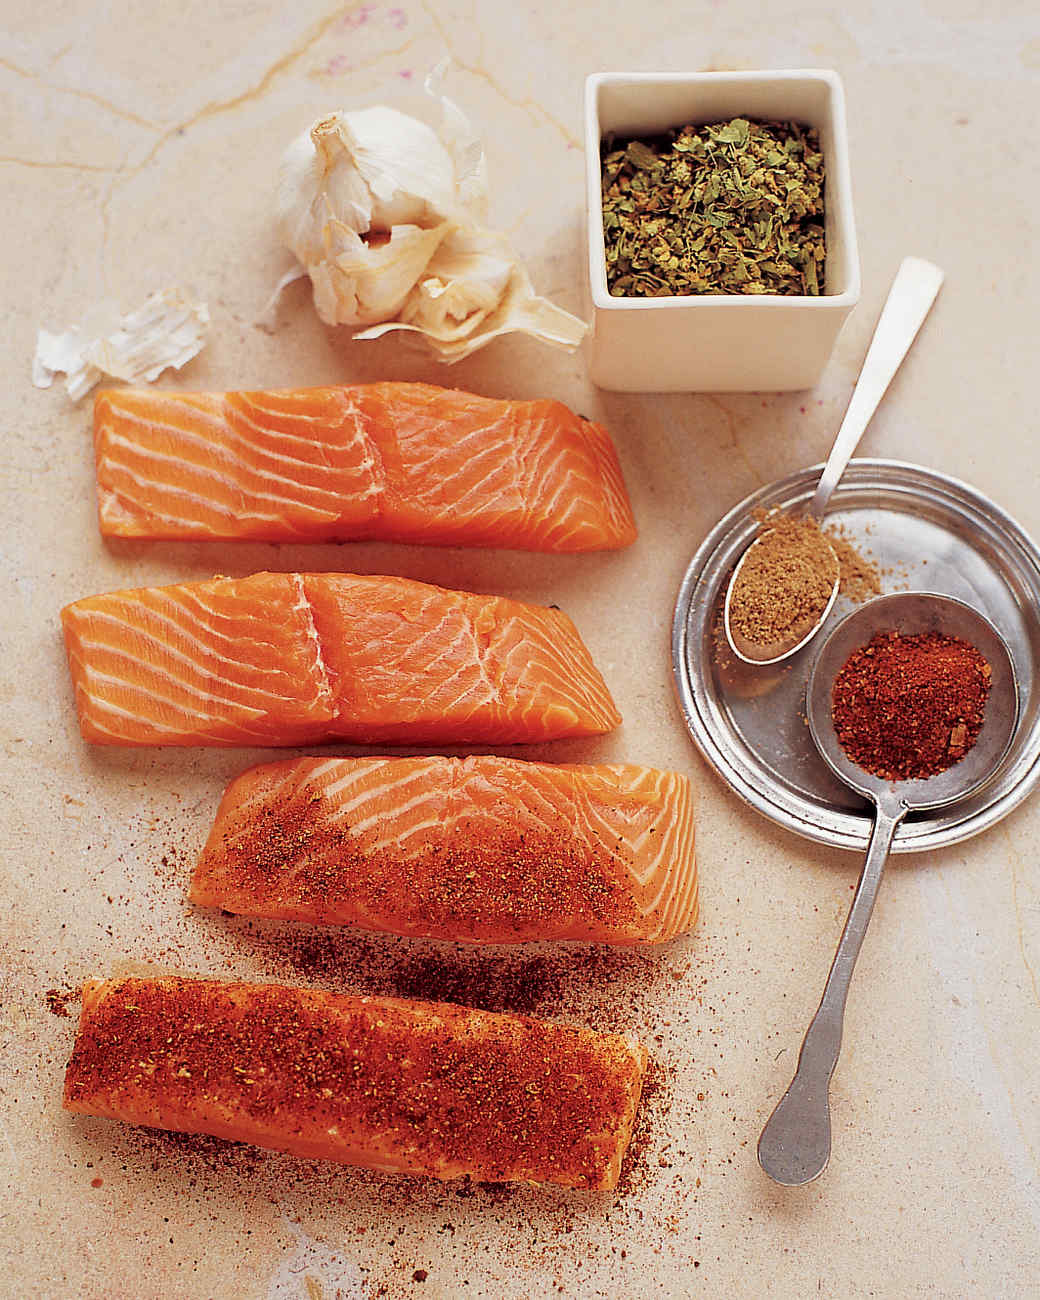 qc_0997_salmon_card_1.jpg